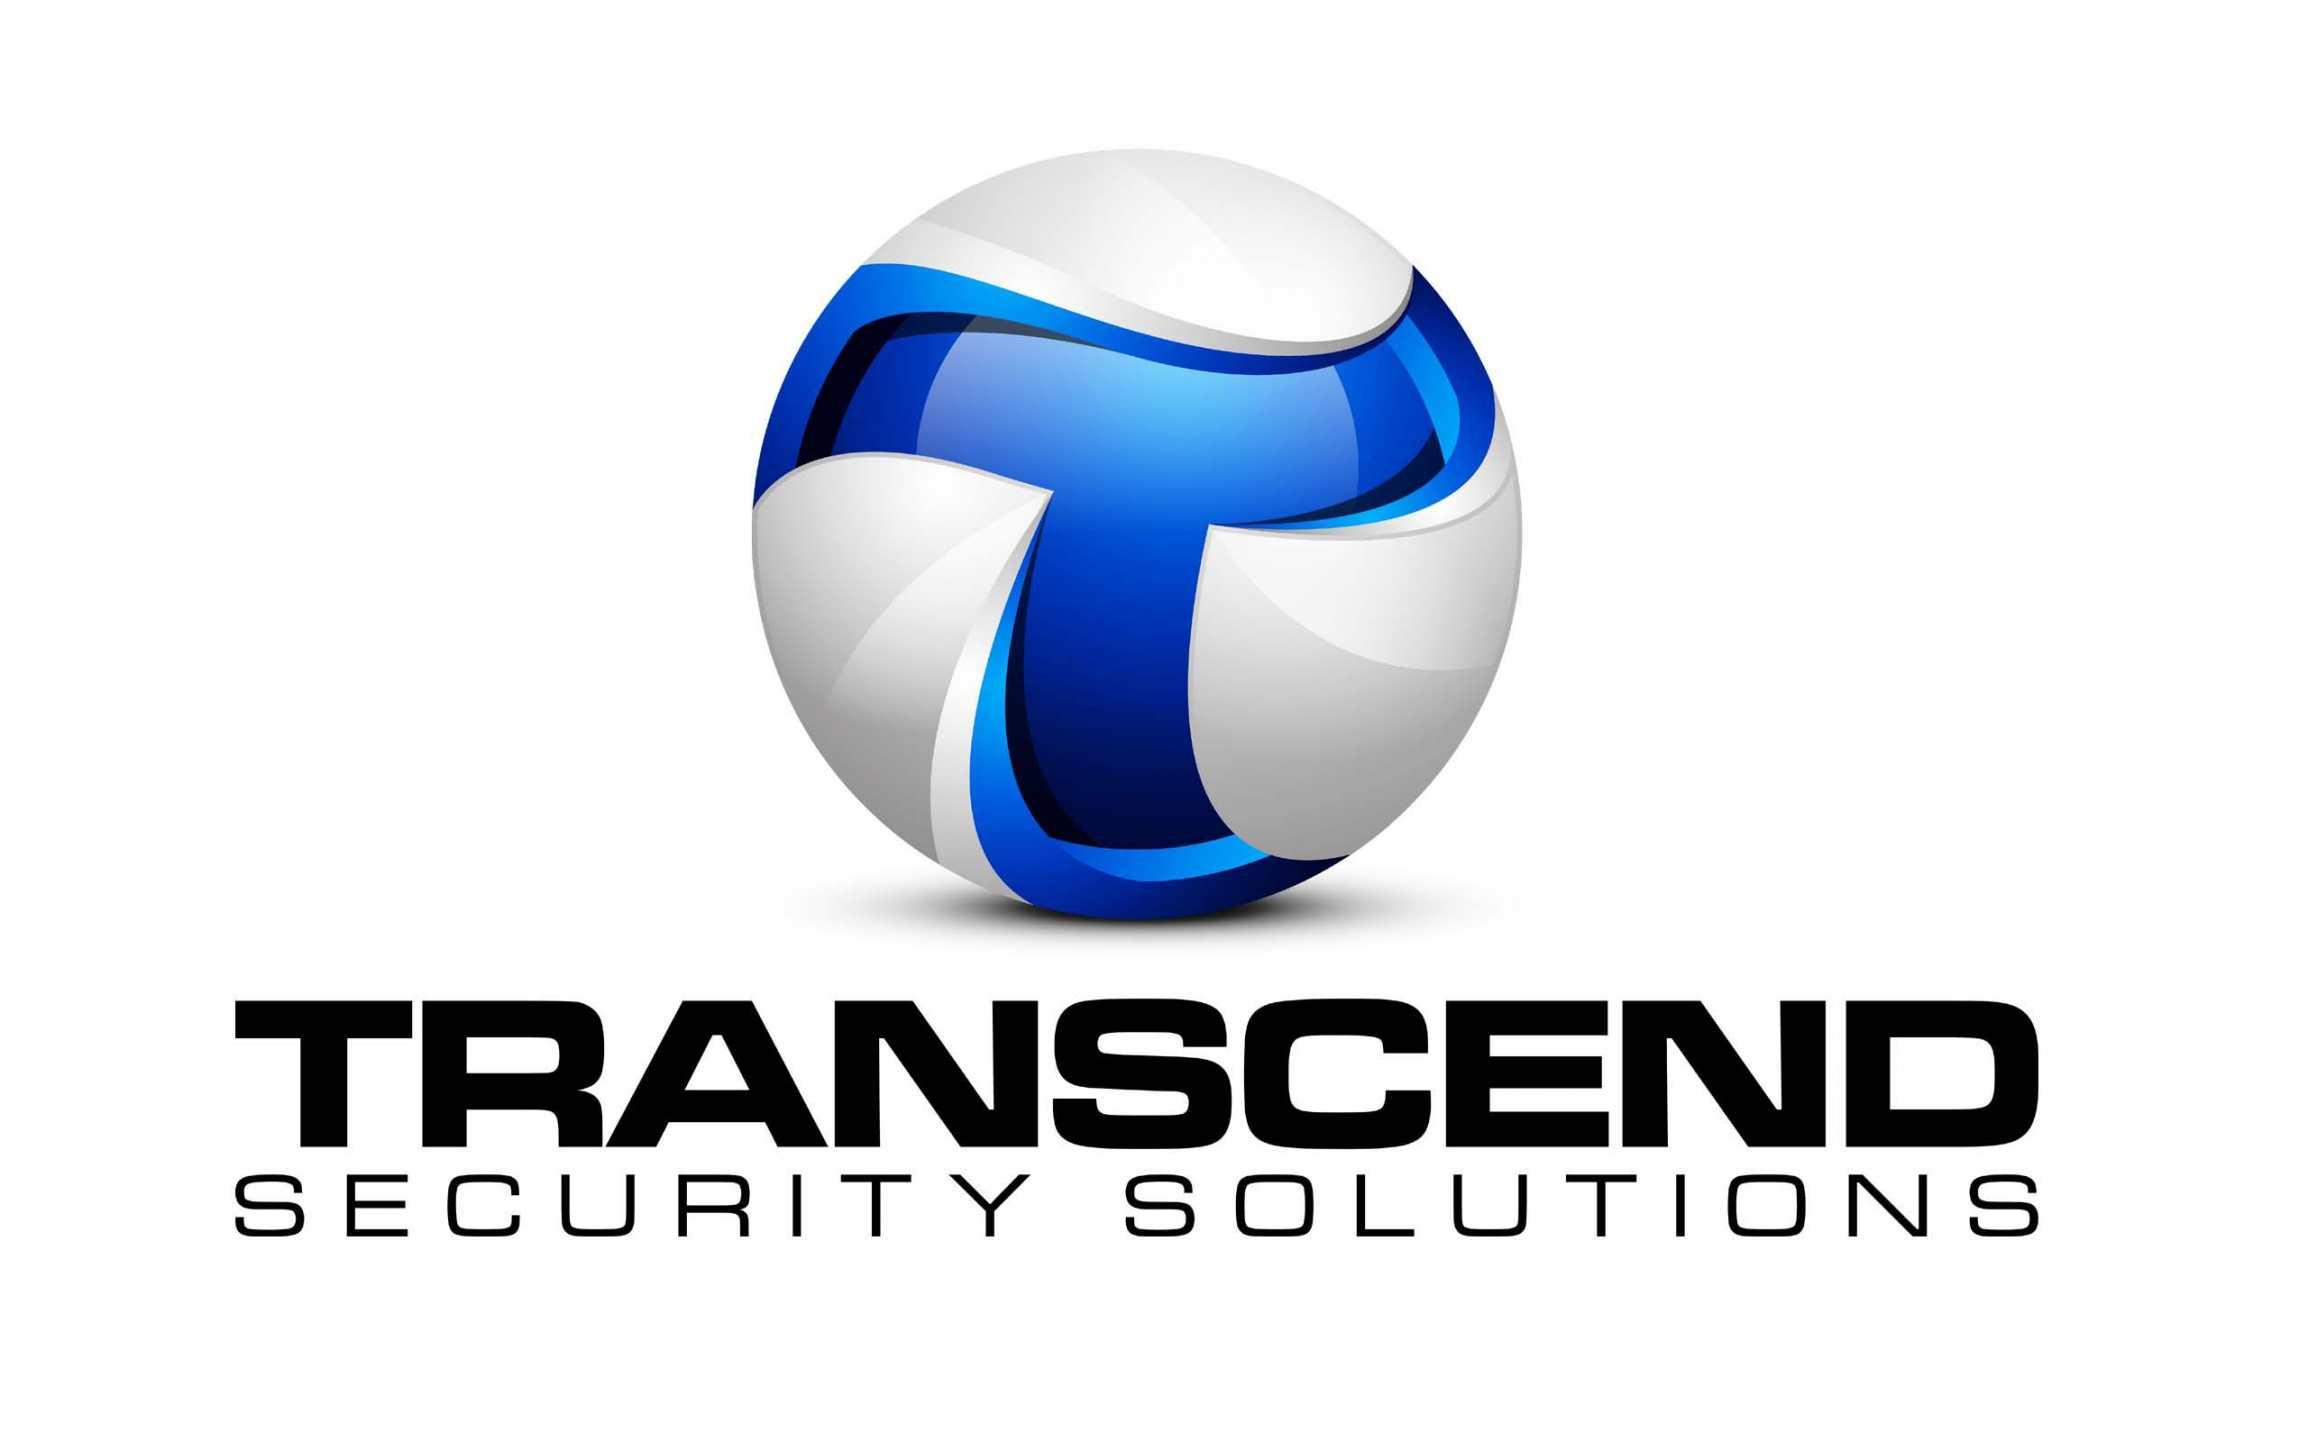 Transcend Security Solutions Logo